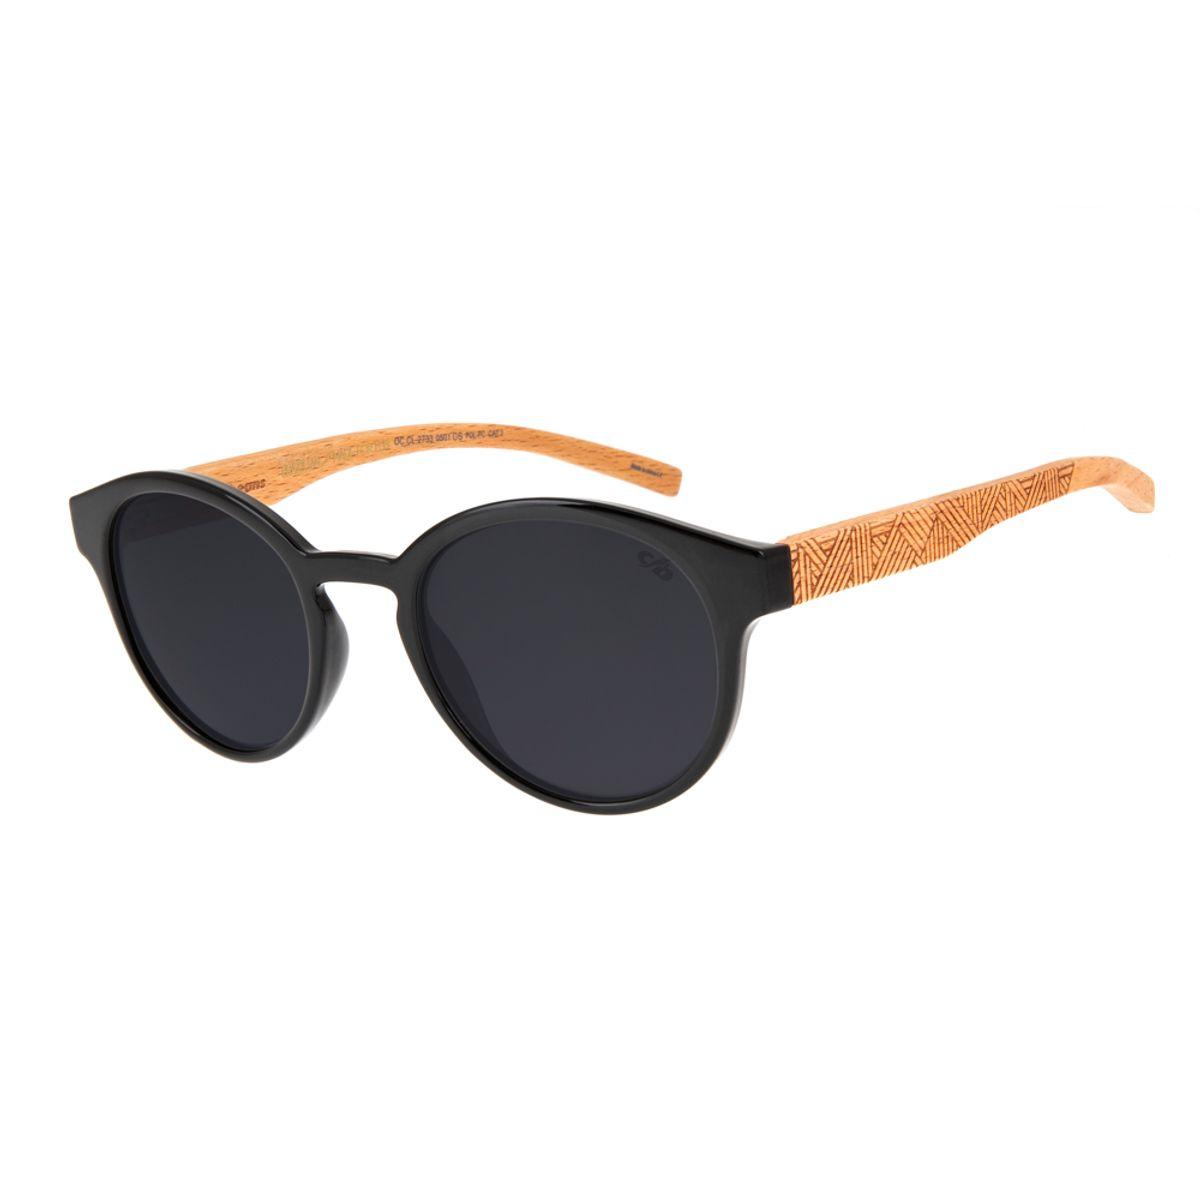 aaa21a996 Óculos de Sol Chilli Beans Masculino Arte de Rua Cranio Preto Bambu  Polarizado 2733 - OC.CL.2733.0501 M. REF: OC.CL.2733.0501. Previous